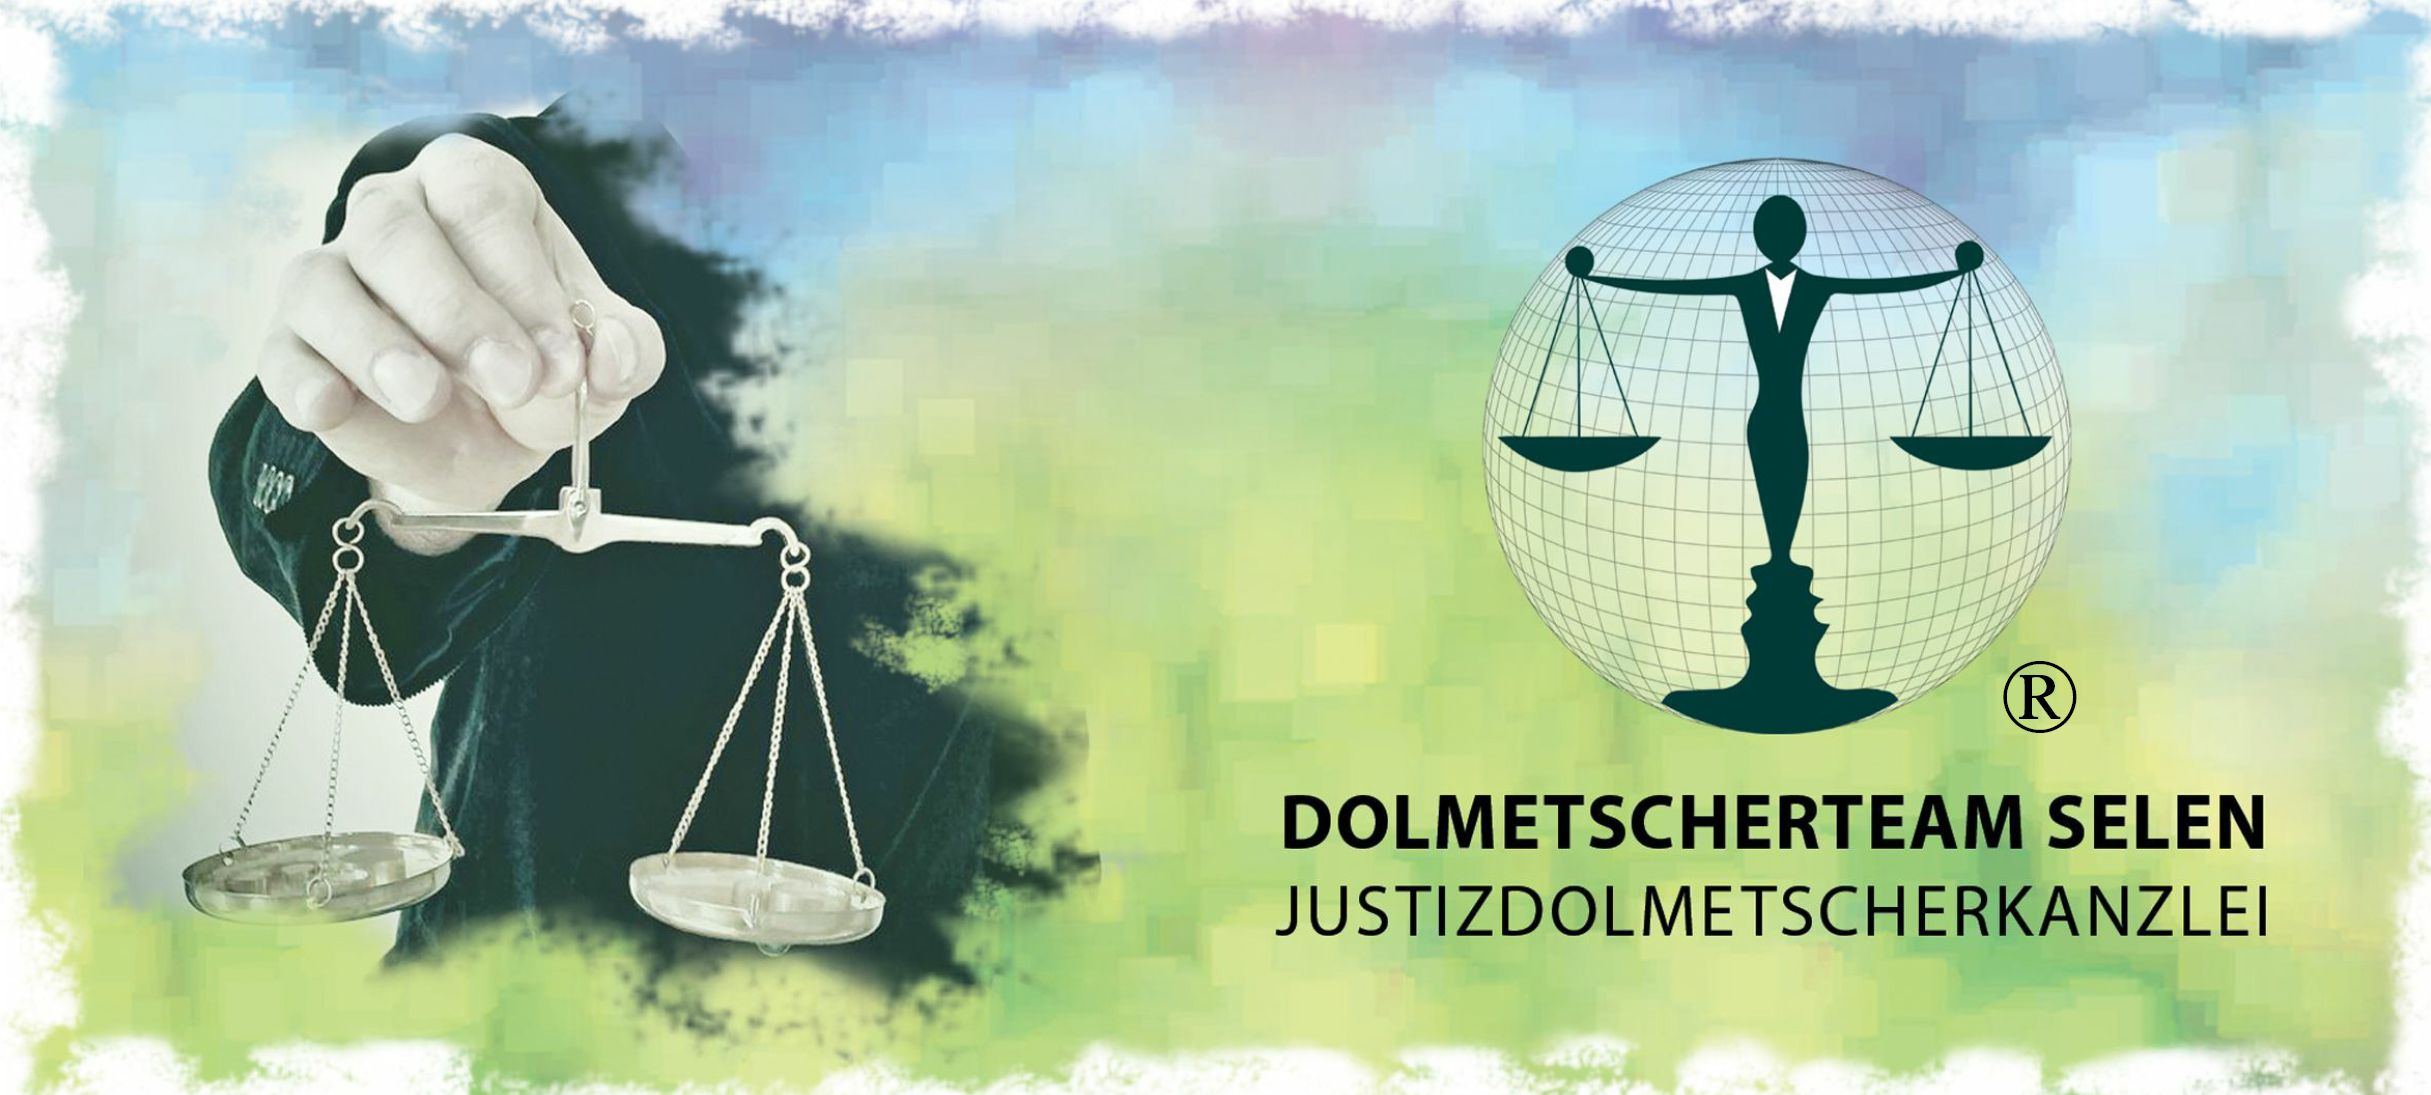 (c) Dolmetscherteam-selen.de